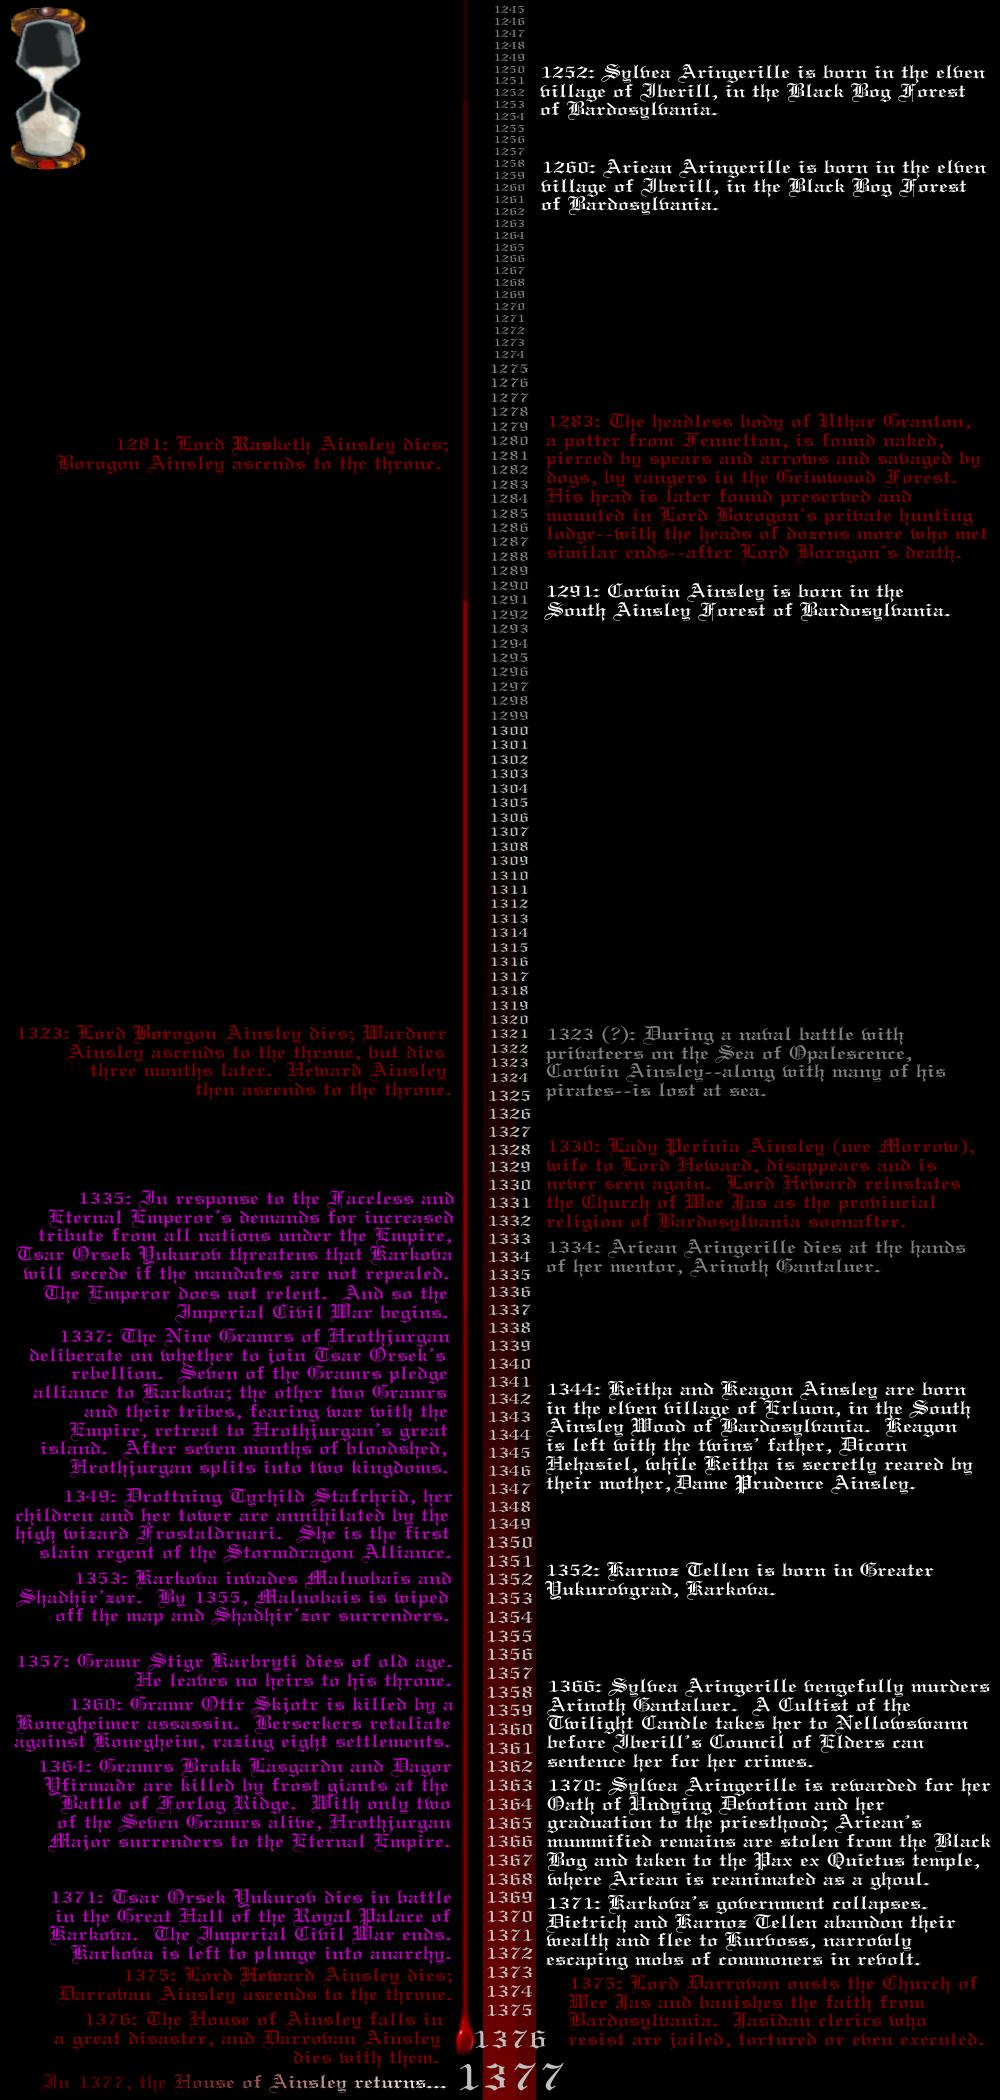 The Timeline AinsleyTimeline3